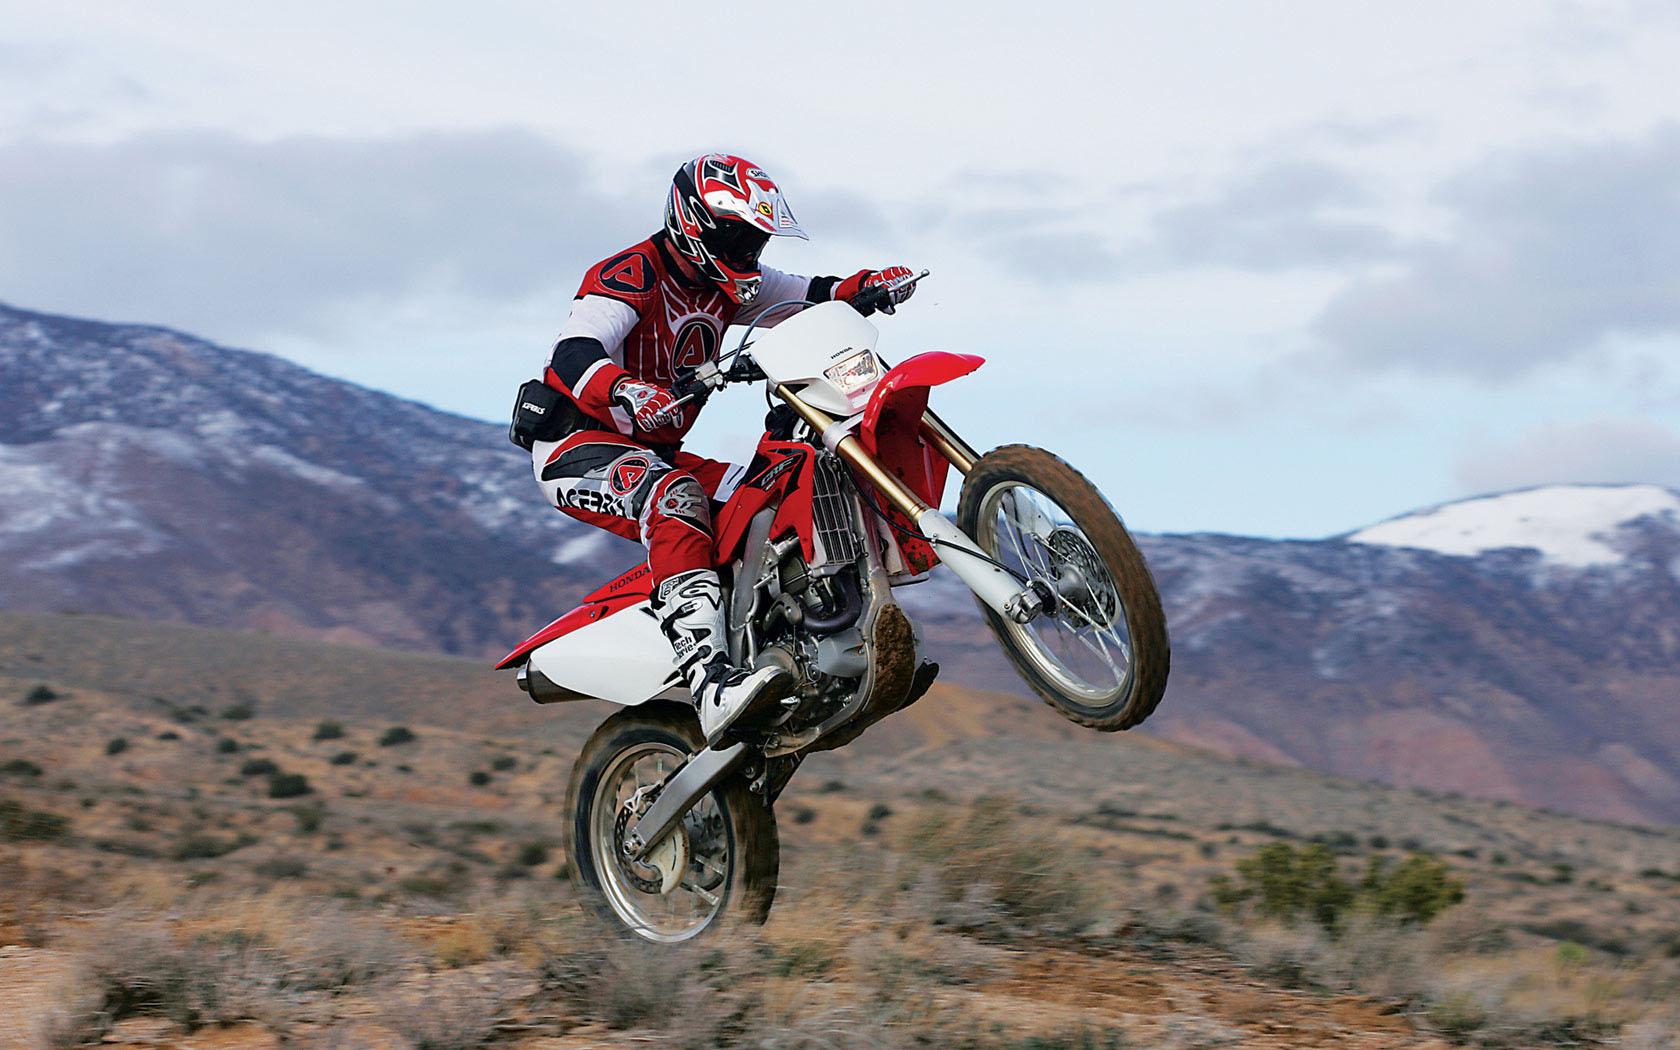 Honda Dirt Bike Photos 1680x1050 0257 MB